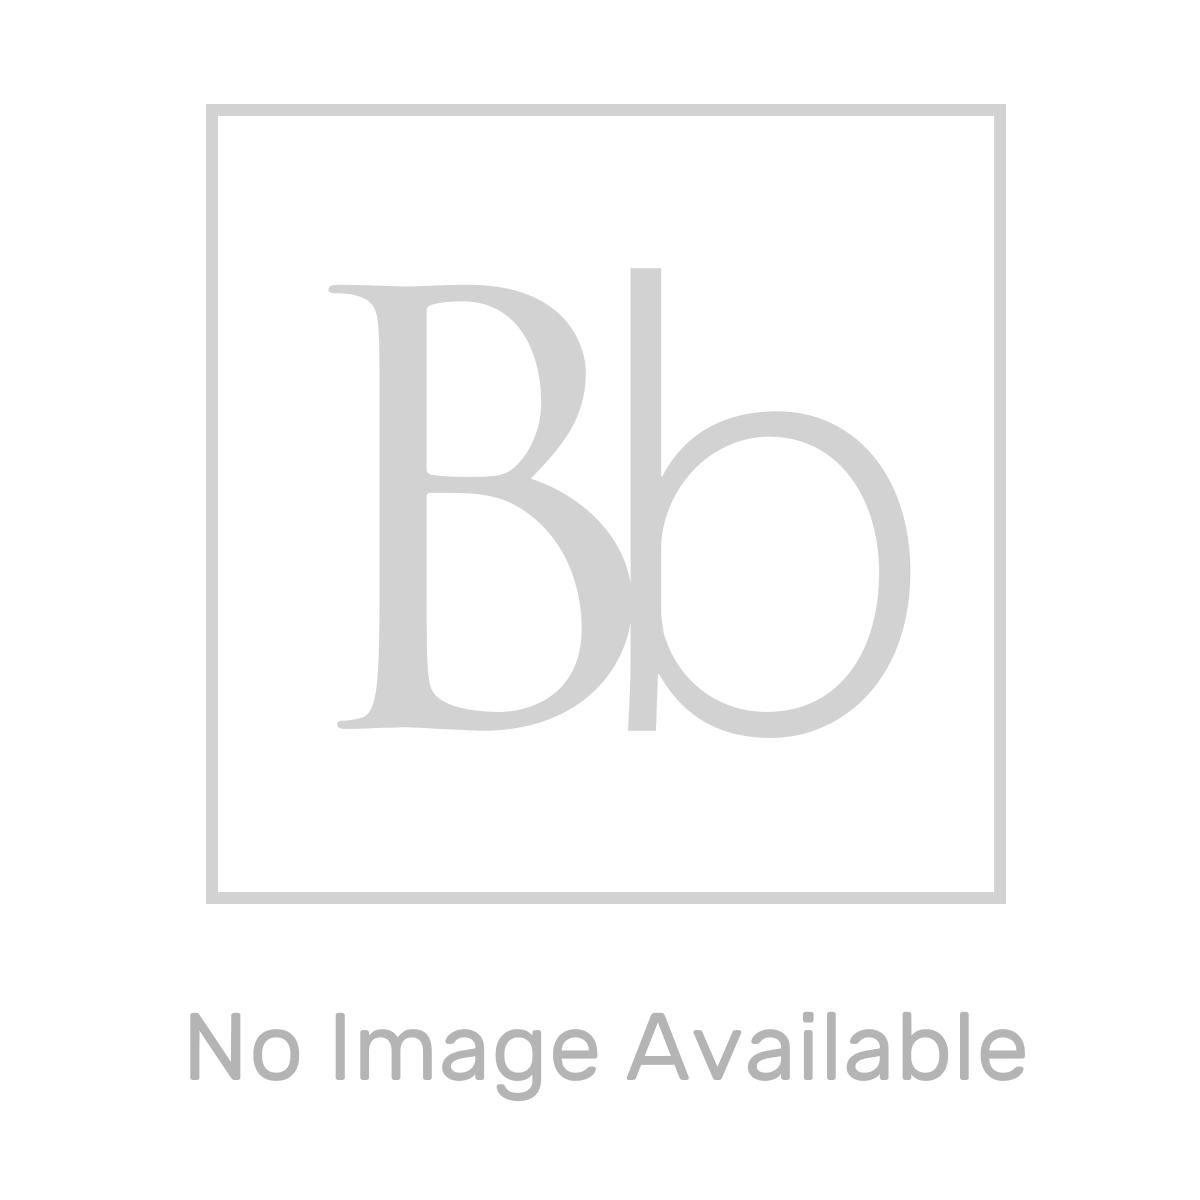 RAK Series 600 En-Suite Bathroom with Corner Entry Shower Enclosure